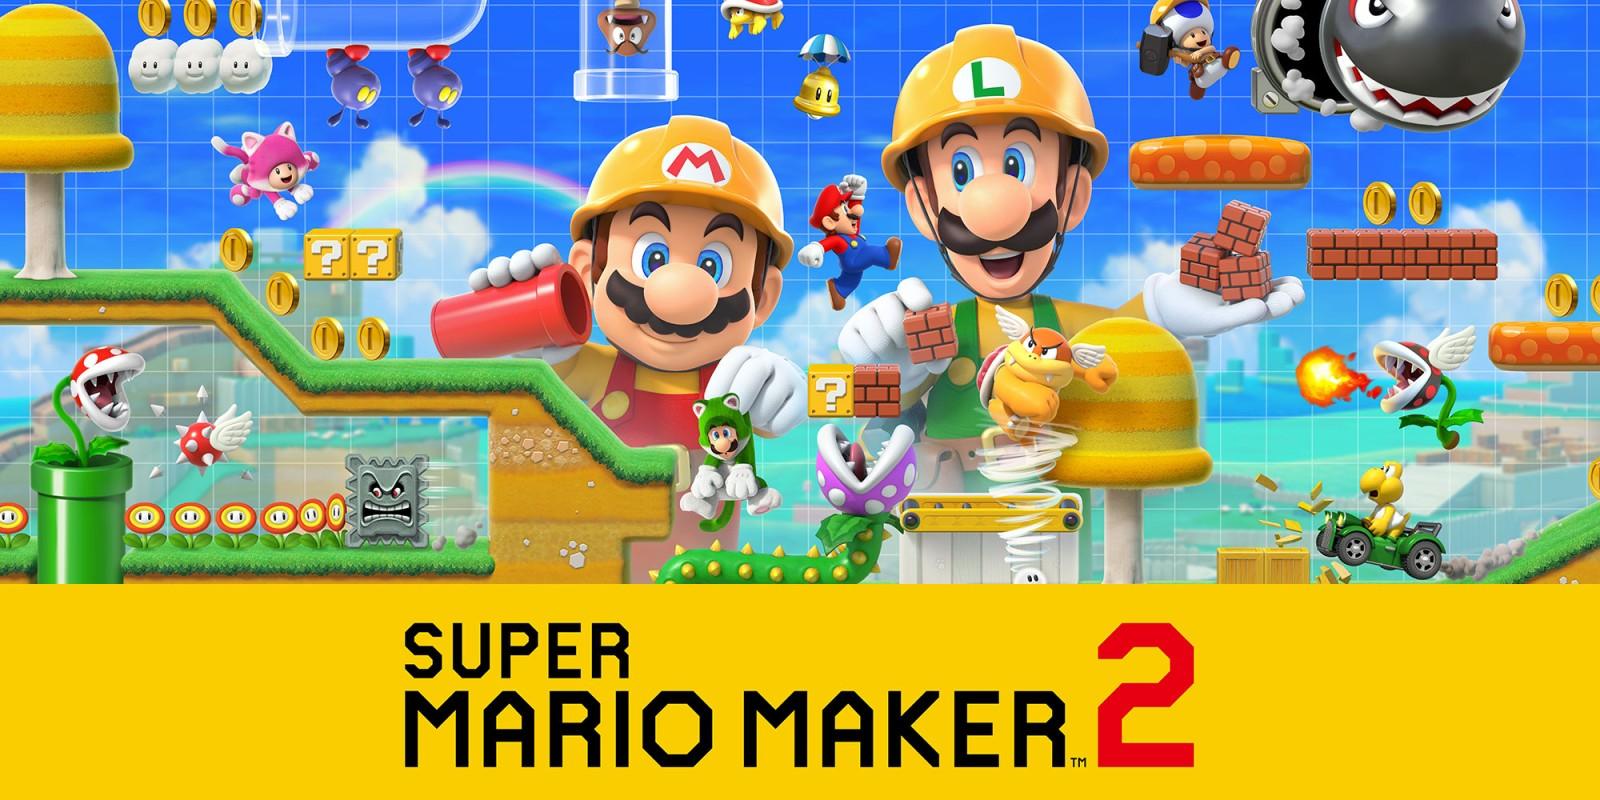 Nintendo Direct Confirms Stellar 2019